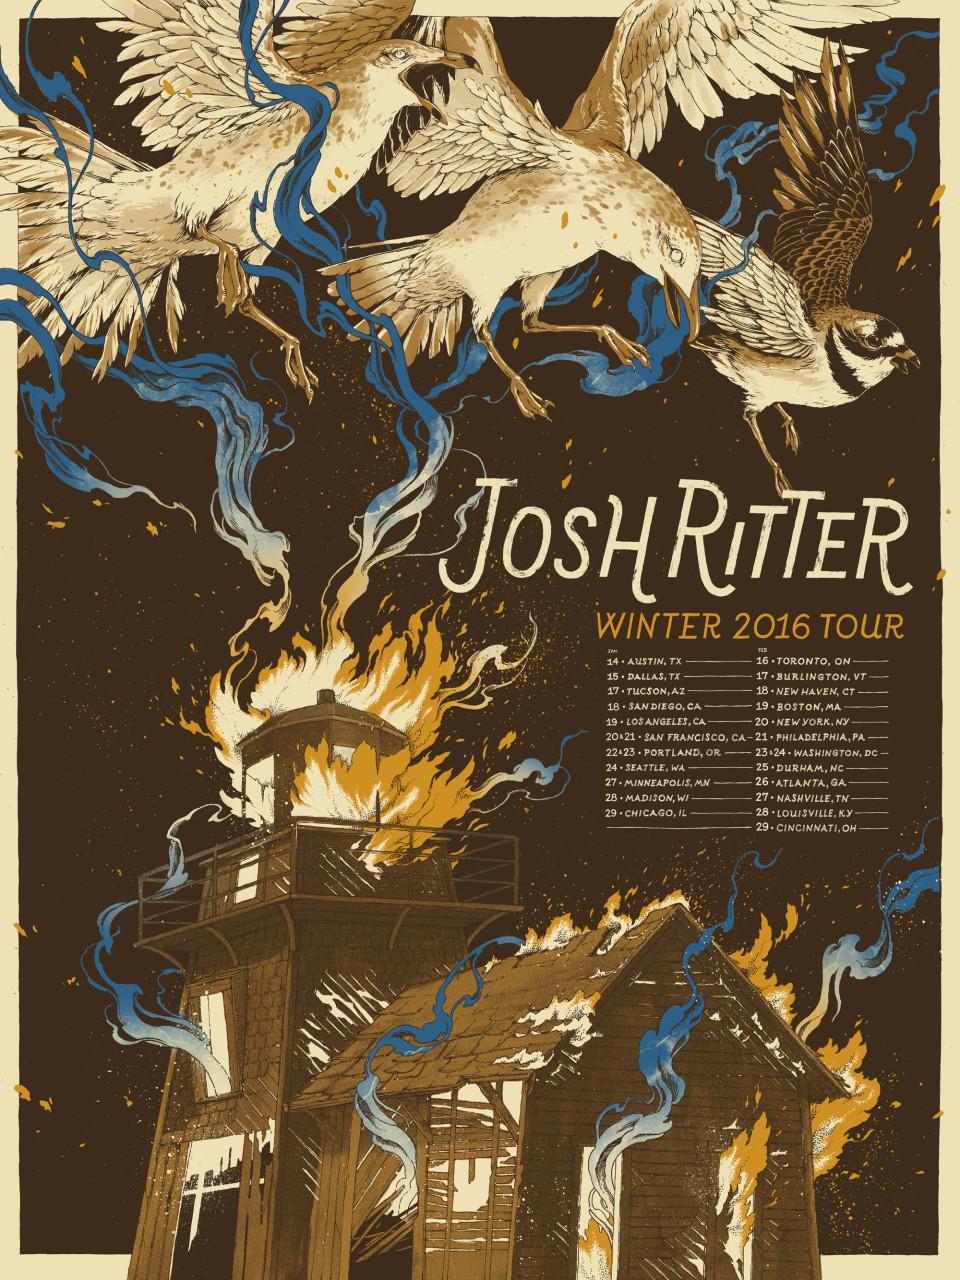 JoshRitter2016Poster_FinalColors_ActualPrints2000w